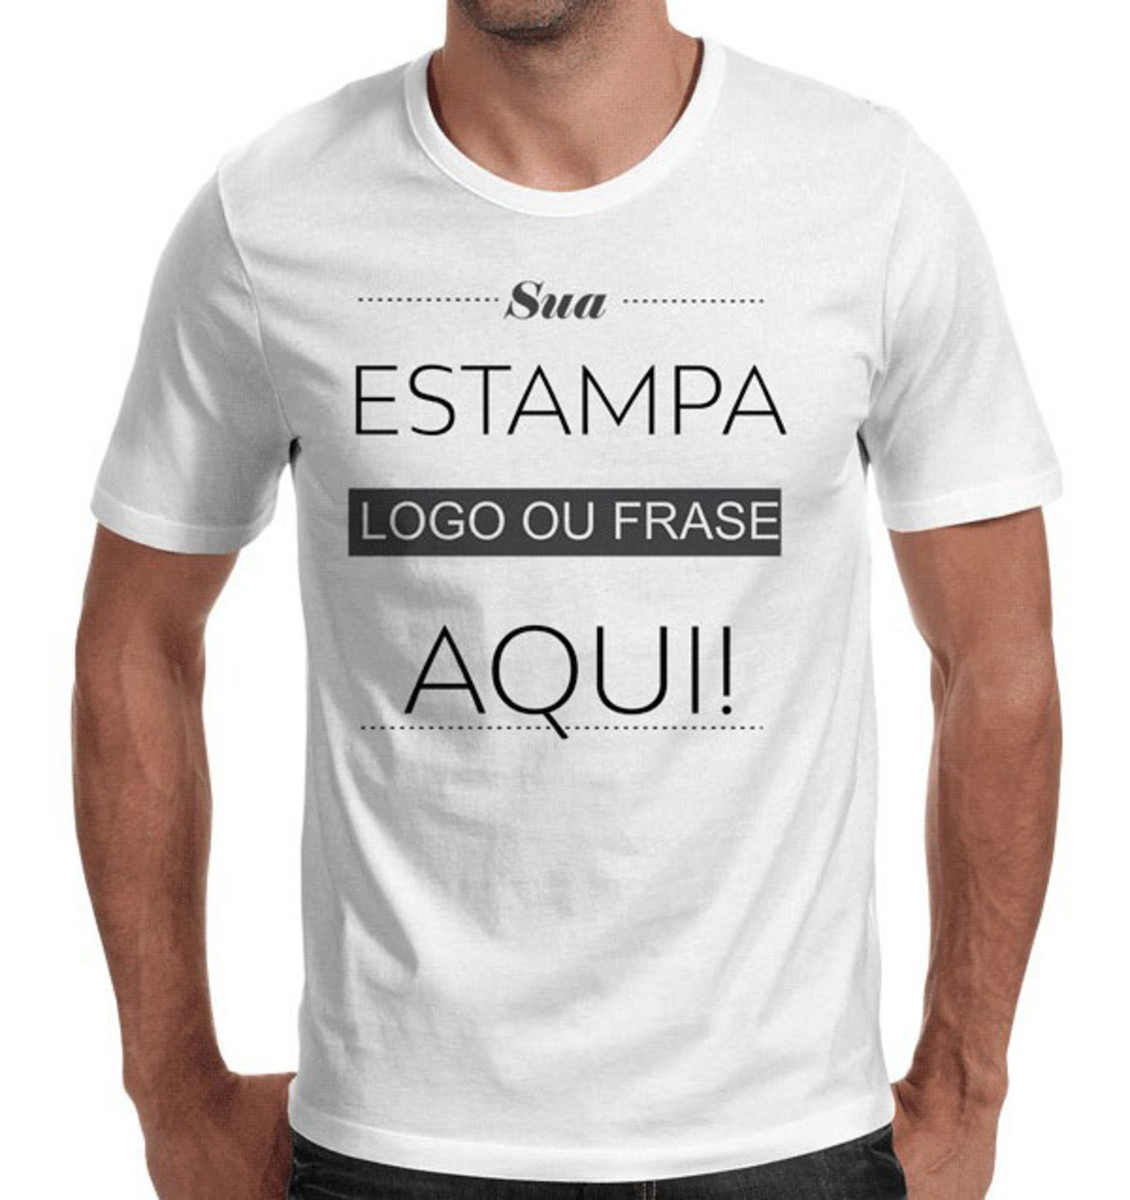 Camiseta Personalizada Sua Estampa Foto Atacado no Elo7  d9f040f4f5c77